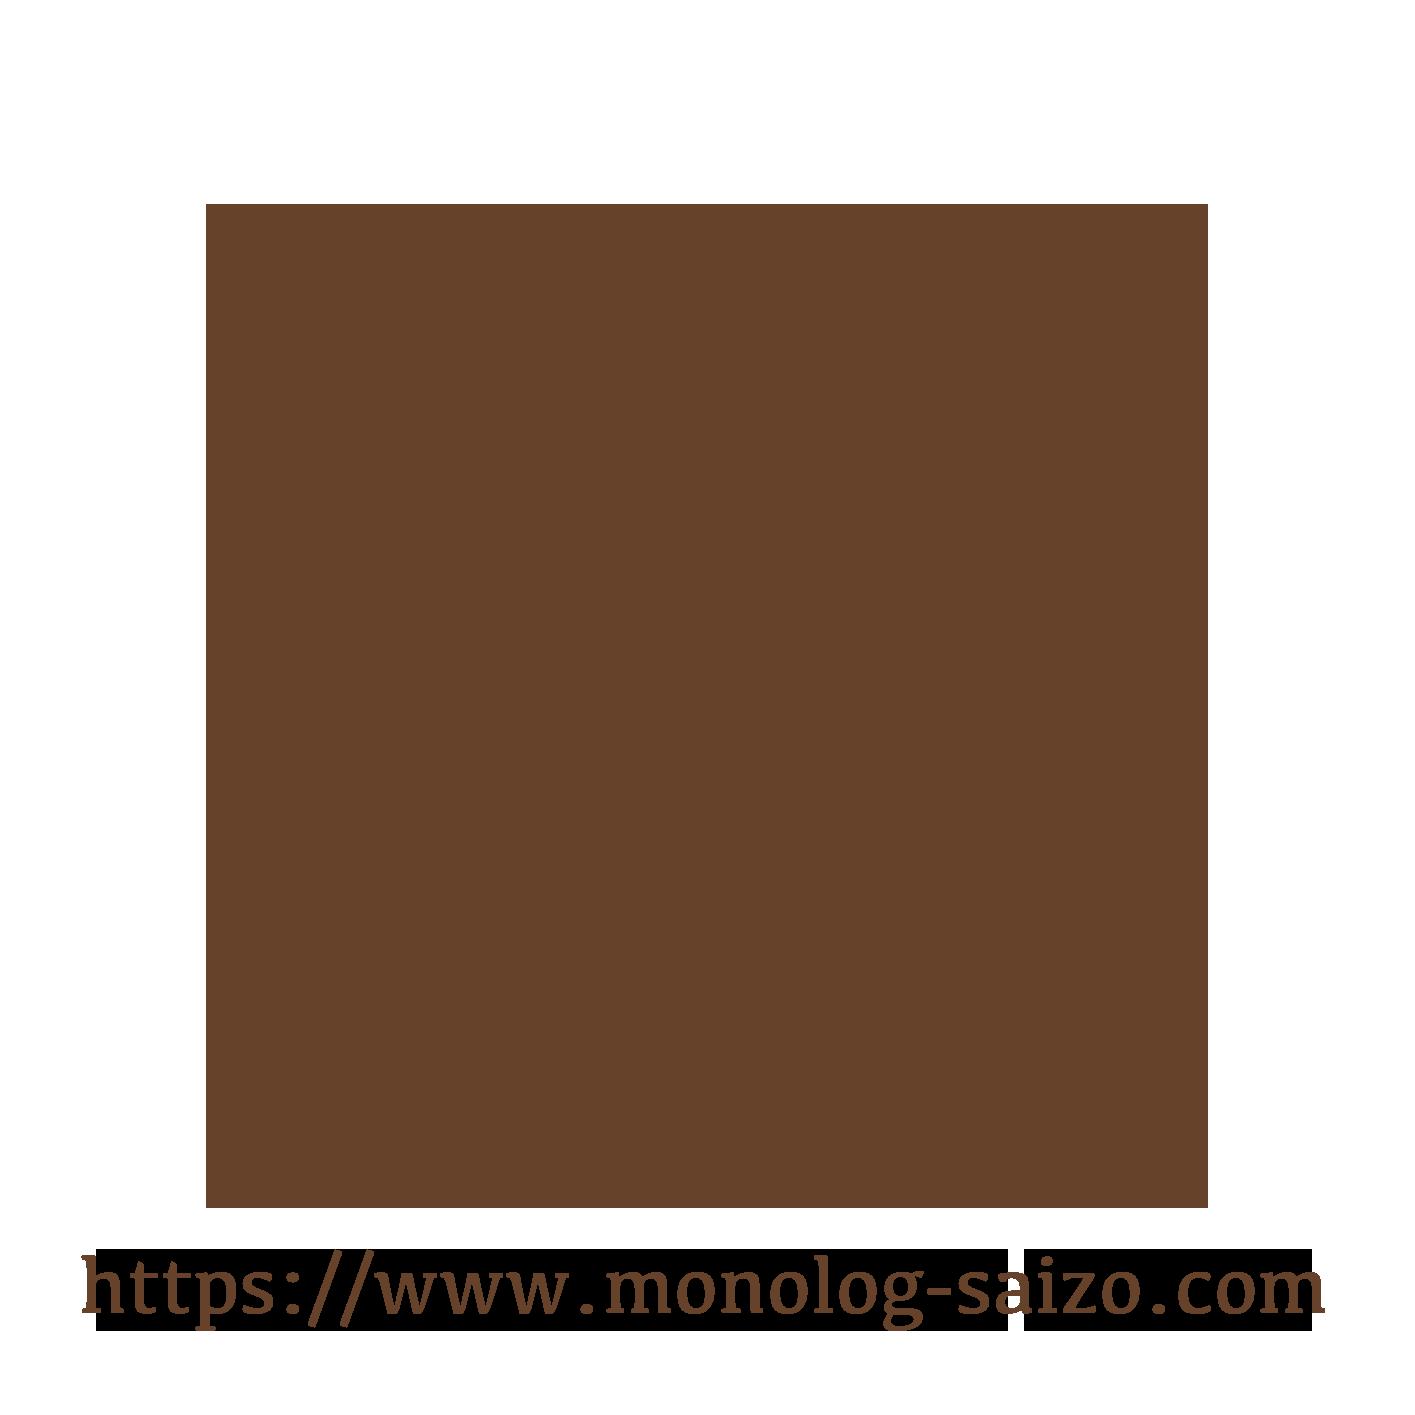 MONOLOG-SAIZO